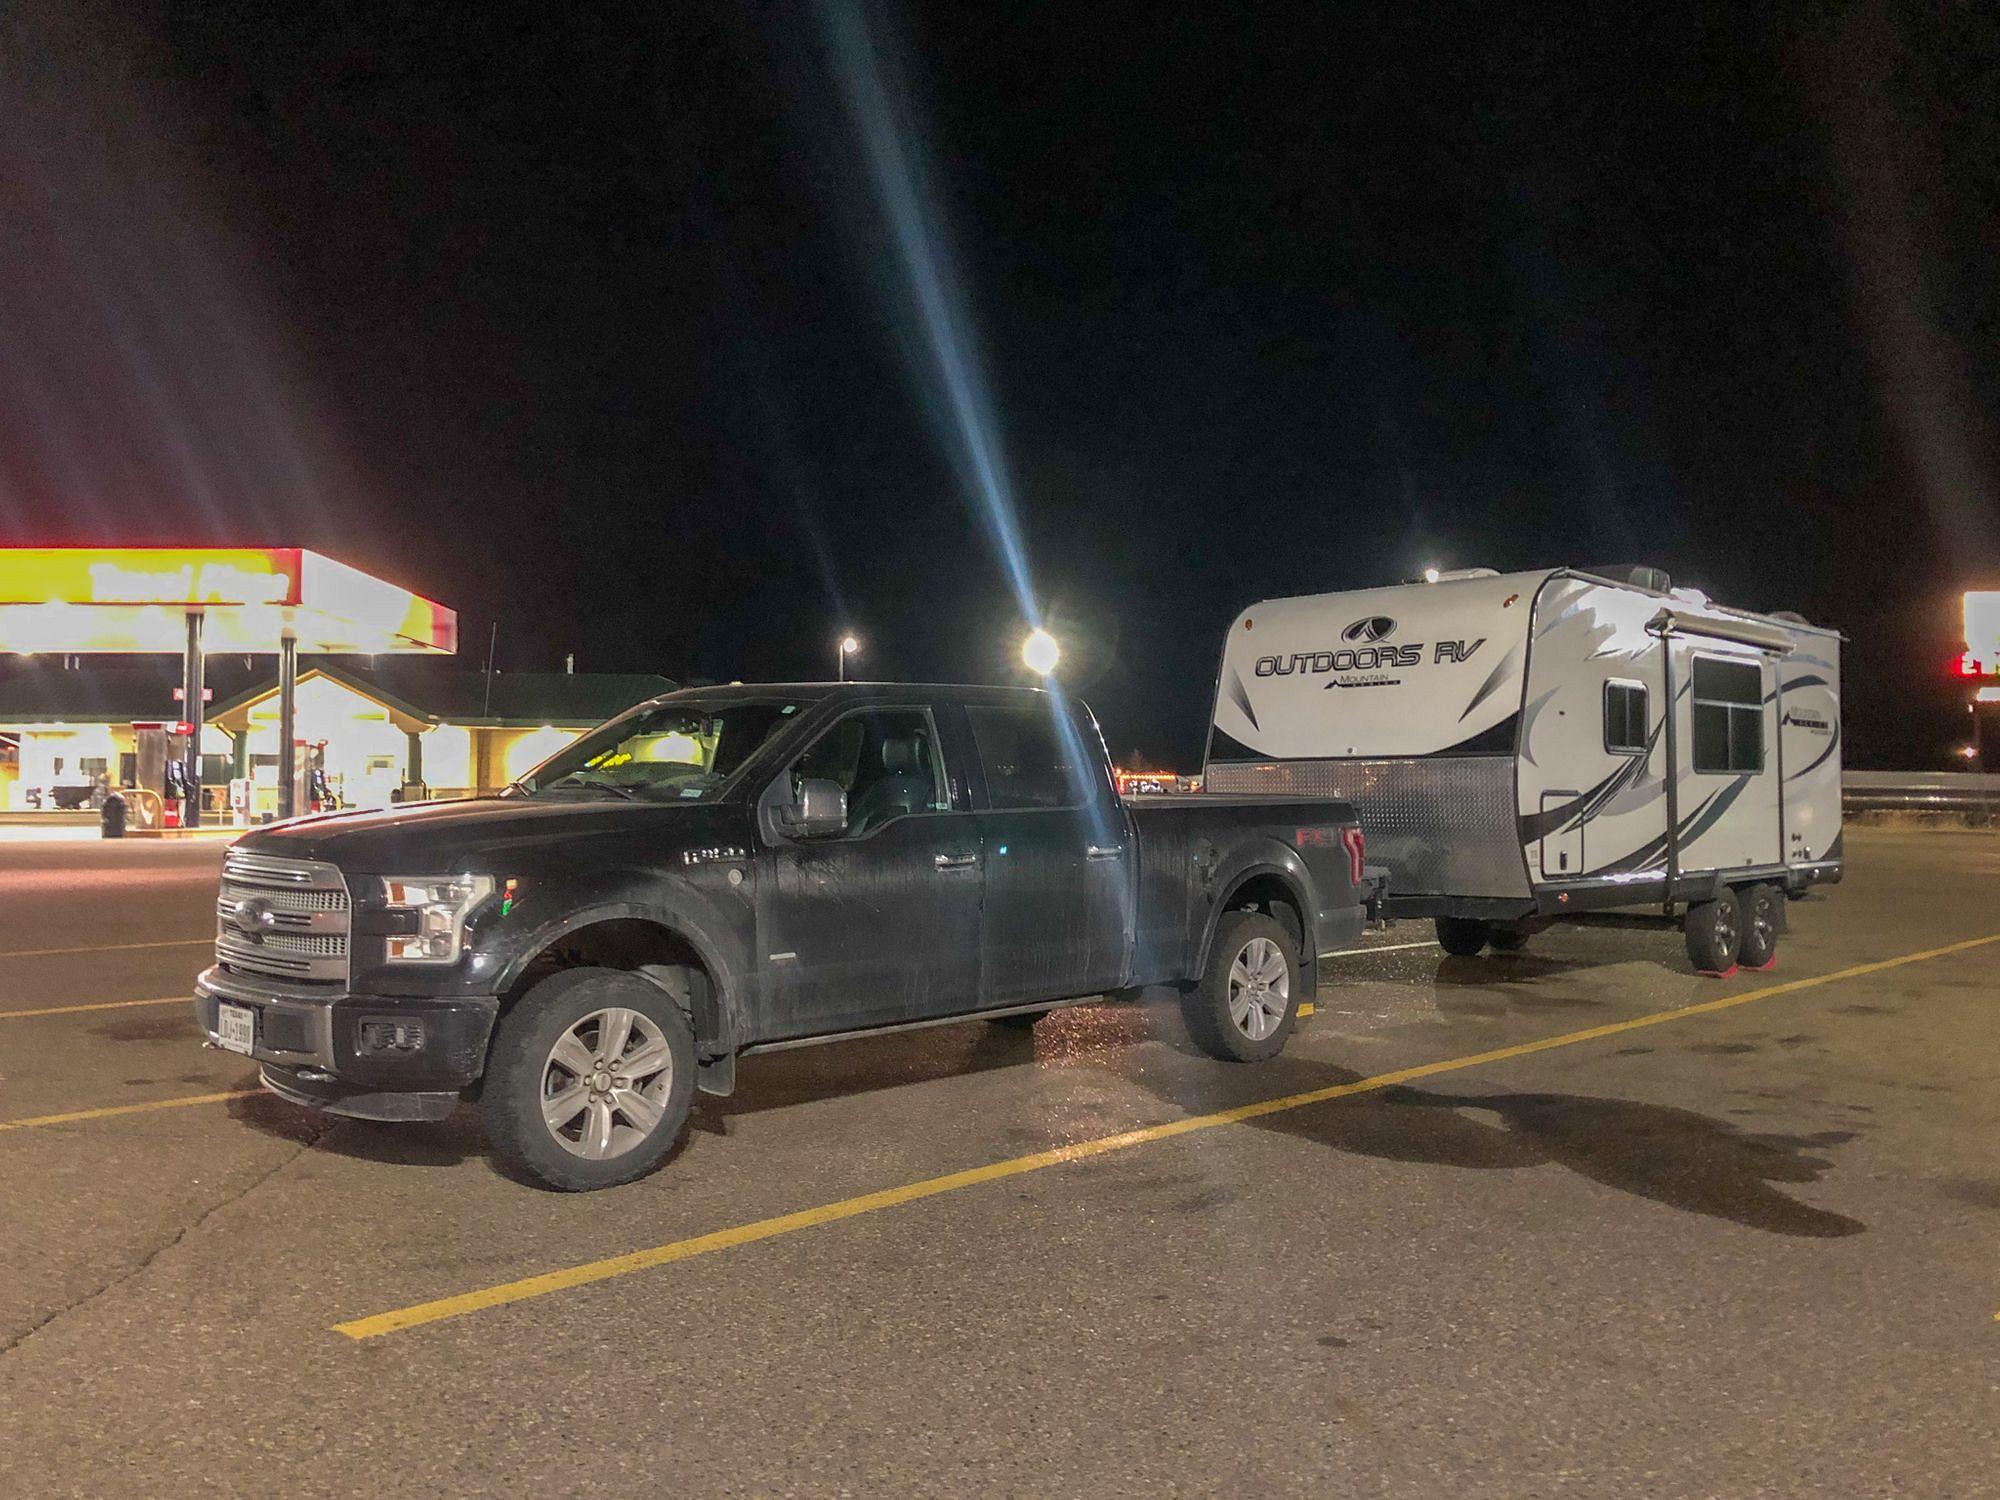 RV Parking at Travel Plazas